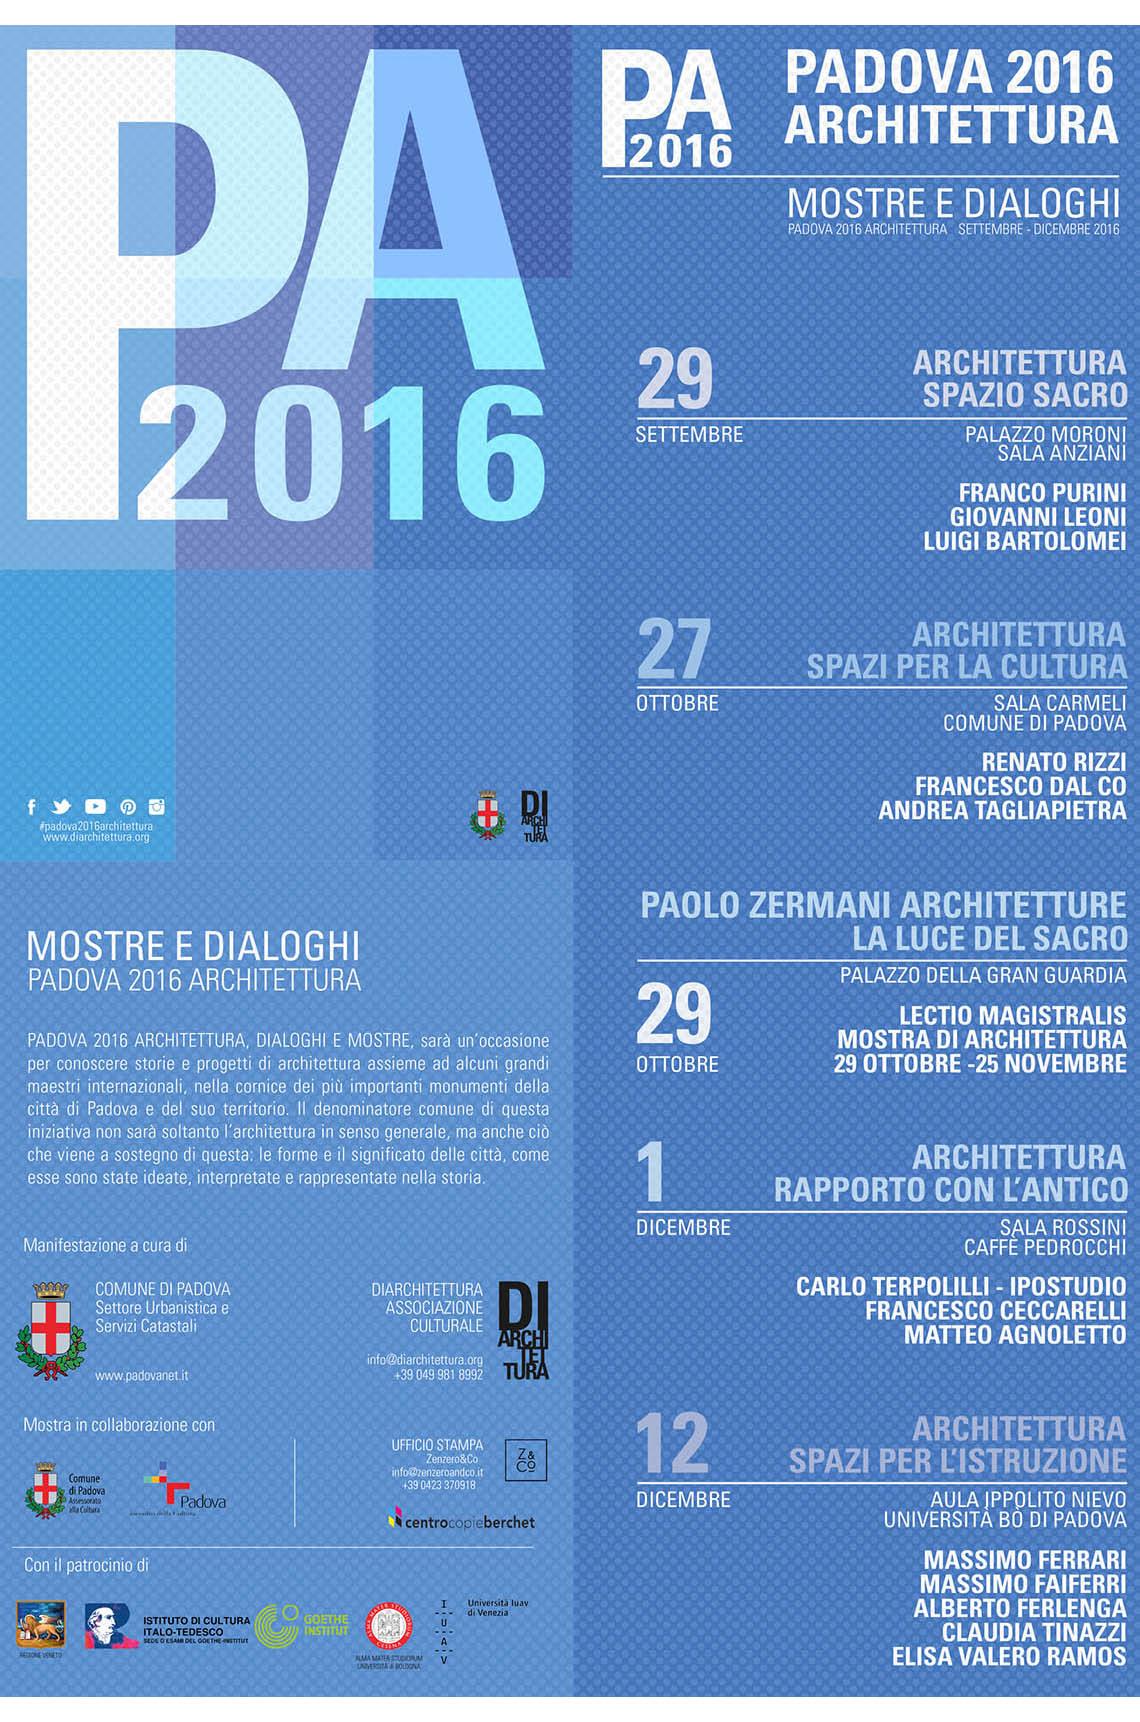 Padova 2016 Architettura - Programma